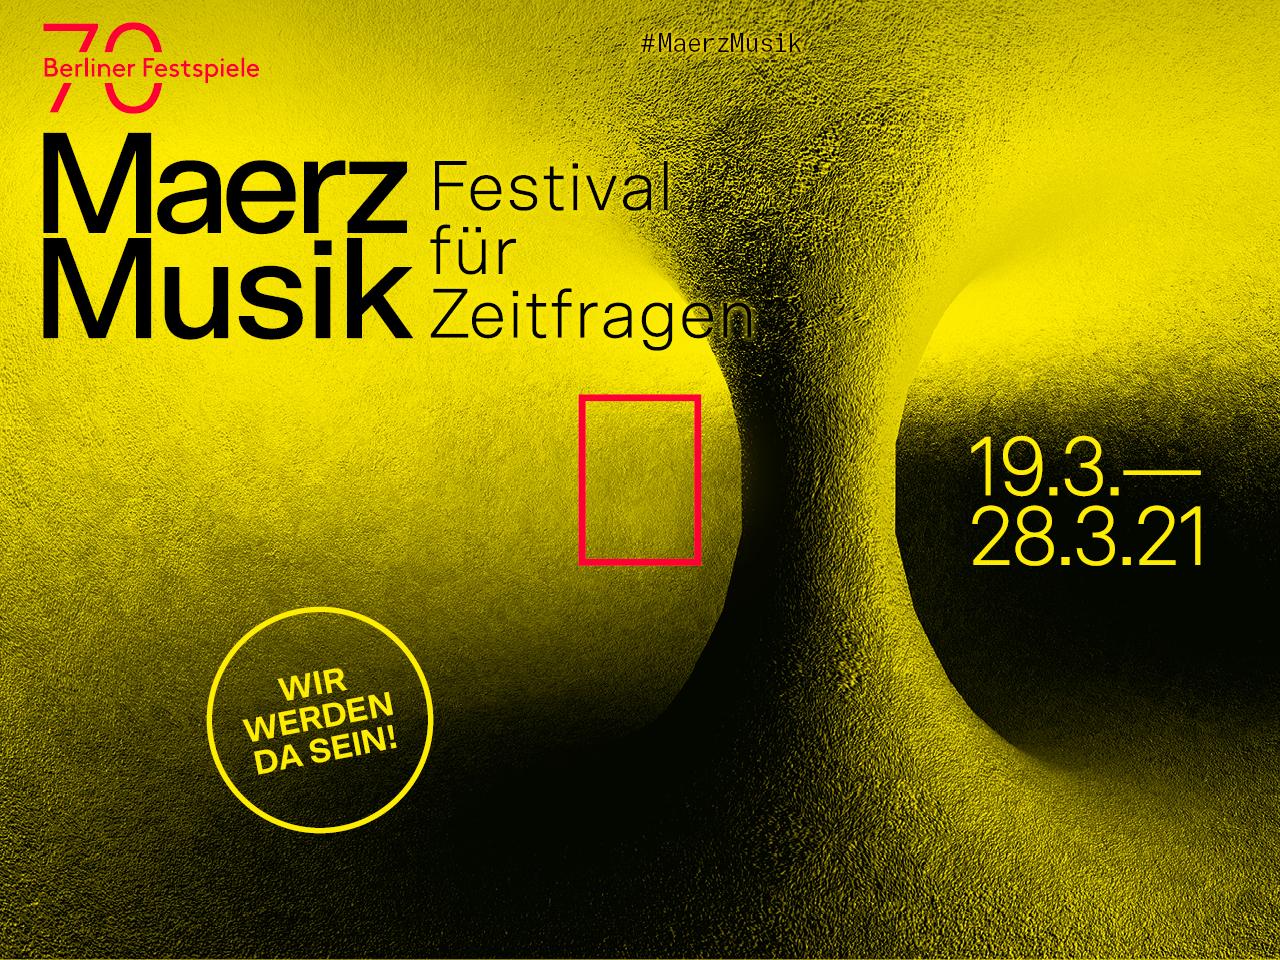 Maerzmusik